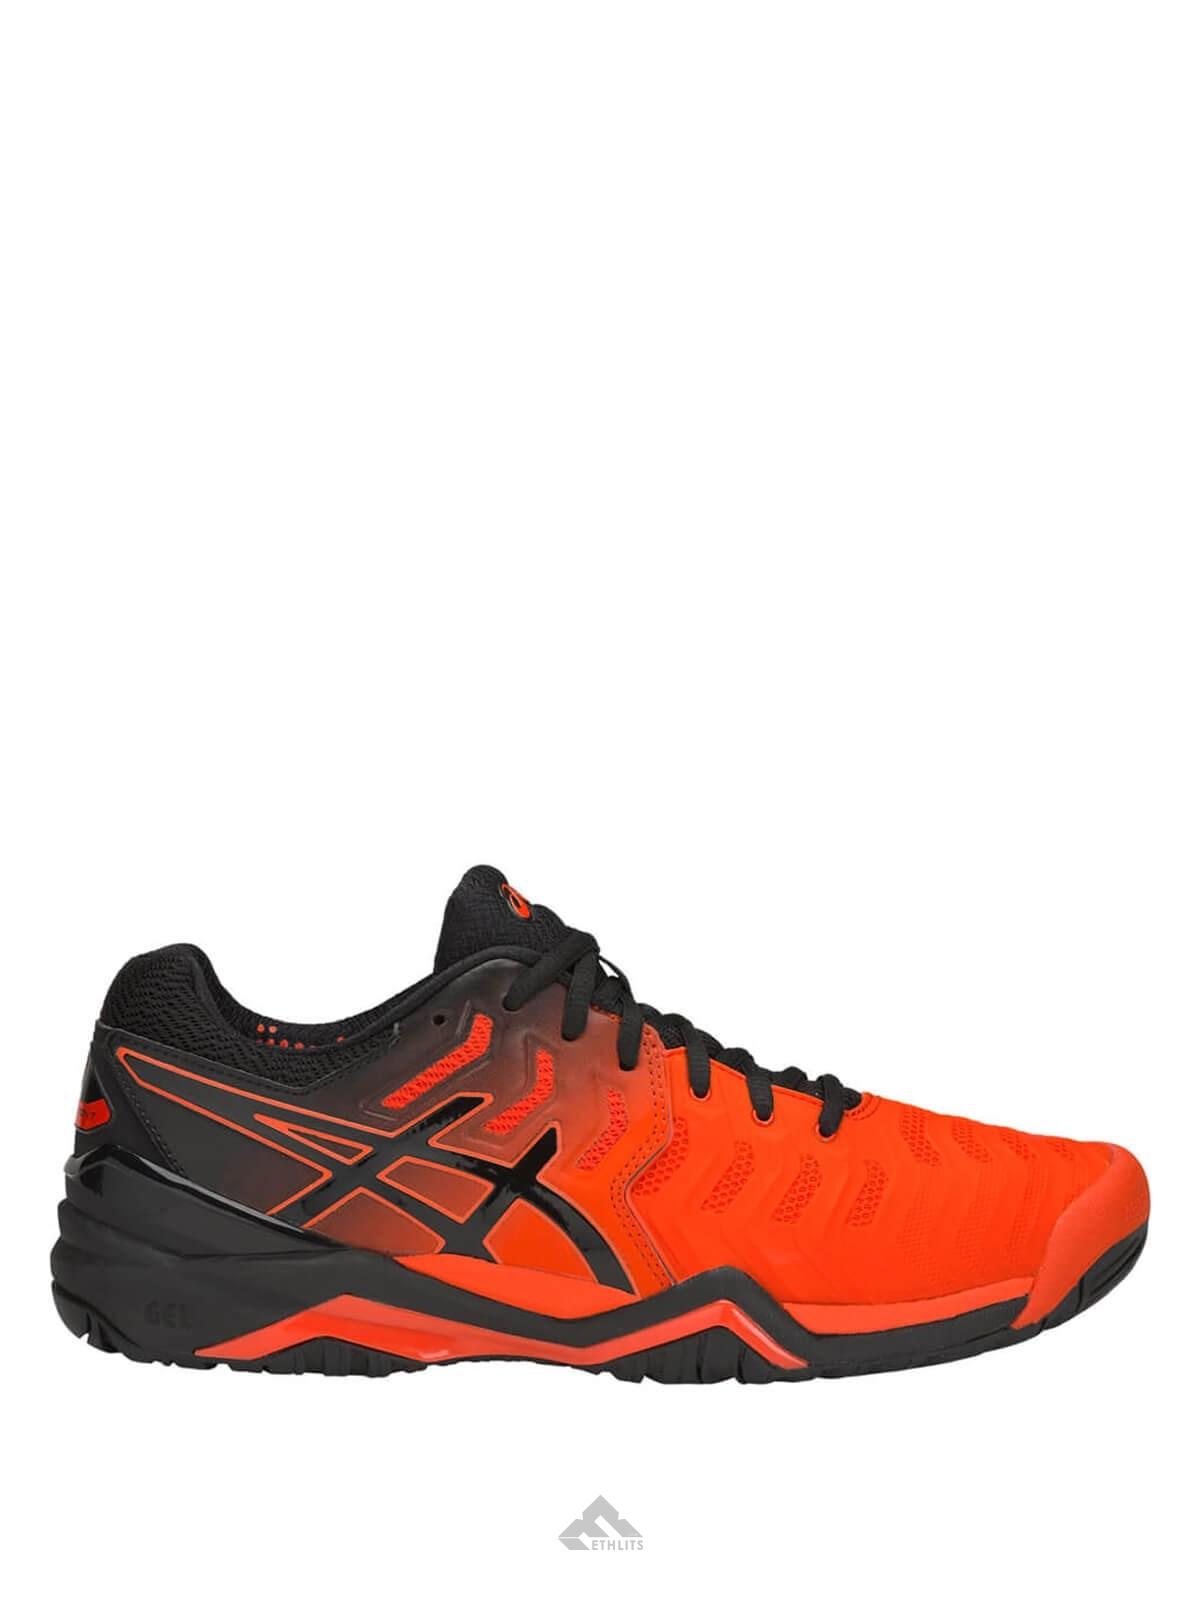 esponja Amigo por correspondencia Soportar  Buy Asics GEL-Resolution 7 Red Cherry Tomato/Black Tennis Shoes Online in  India at Best Price, Reviews